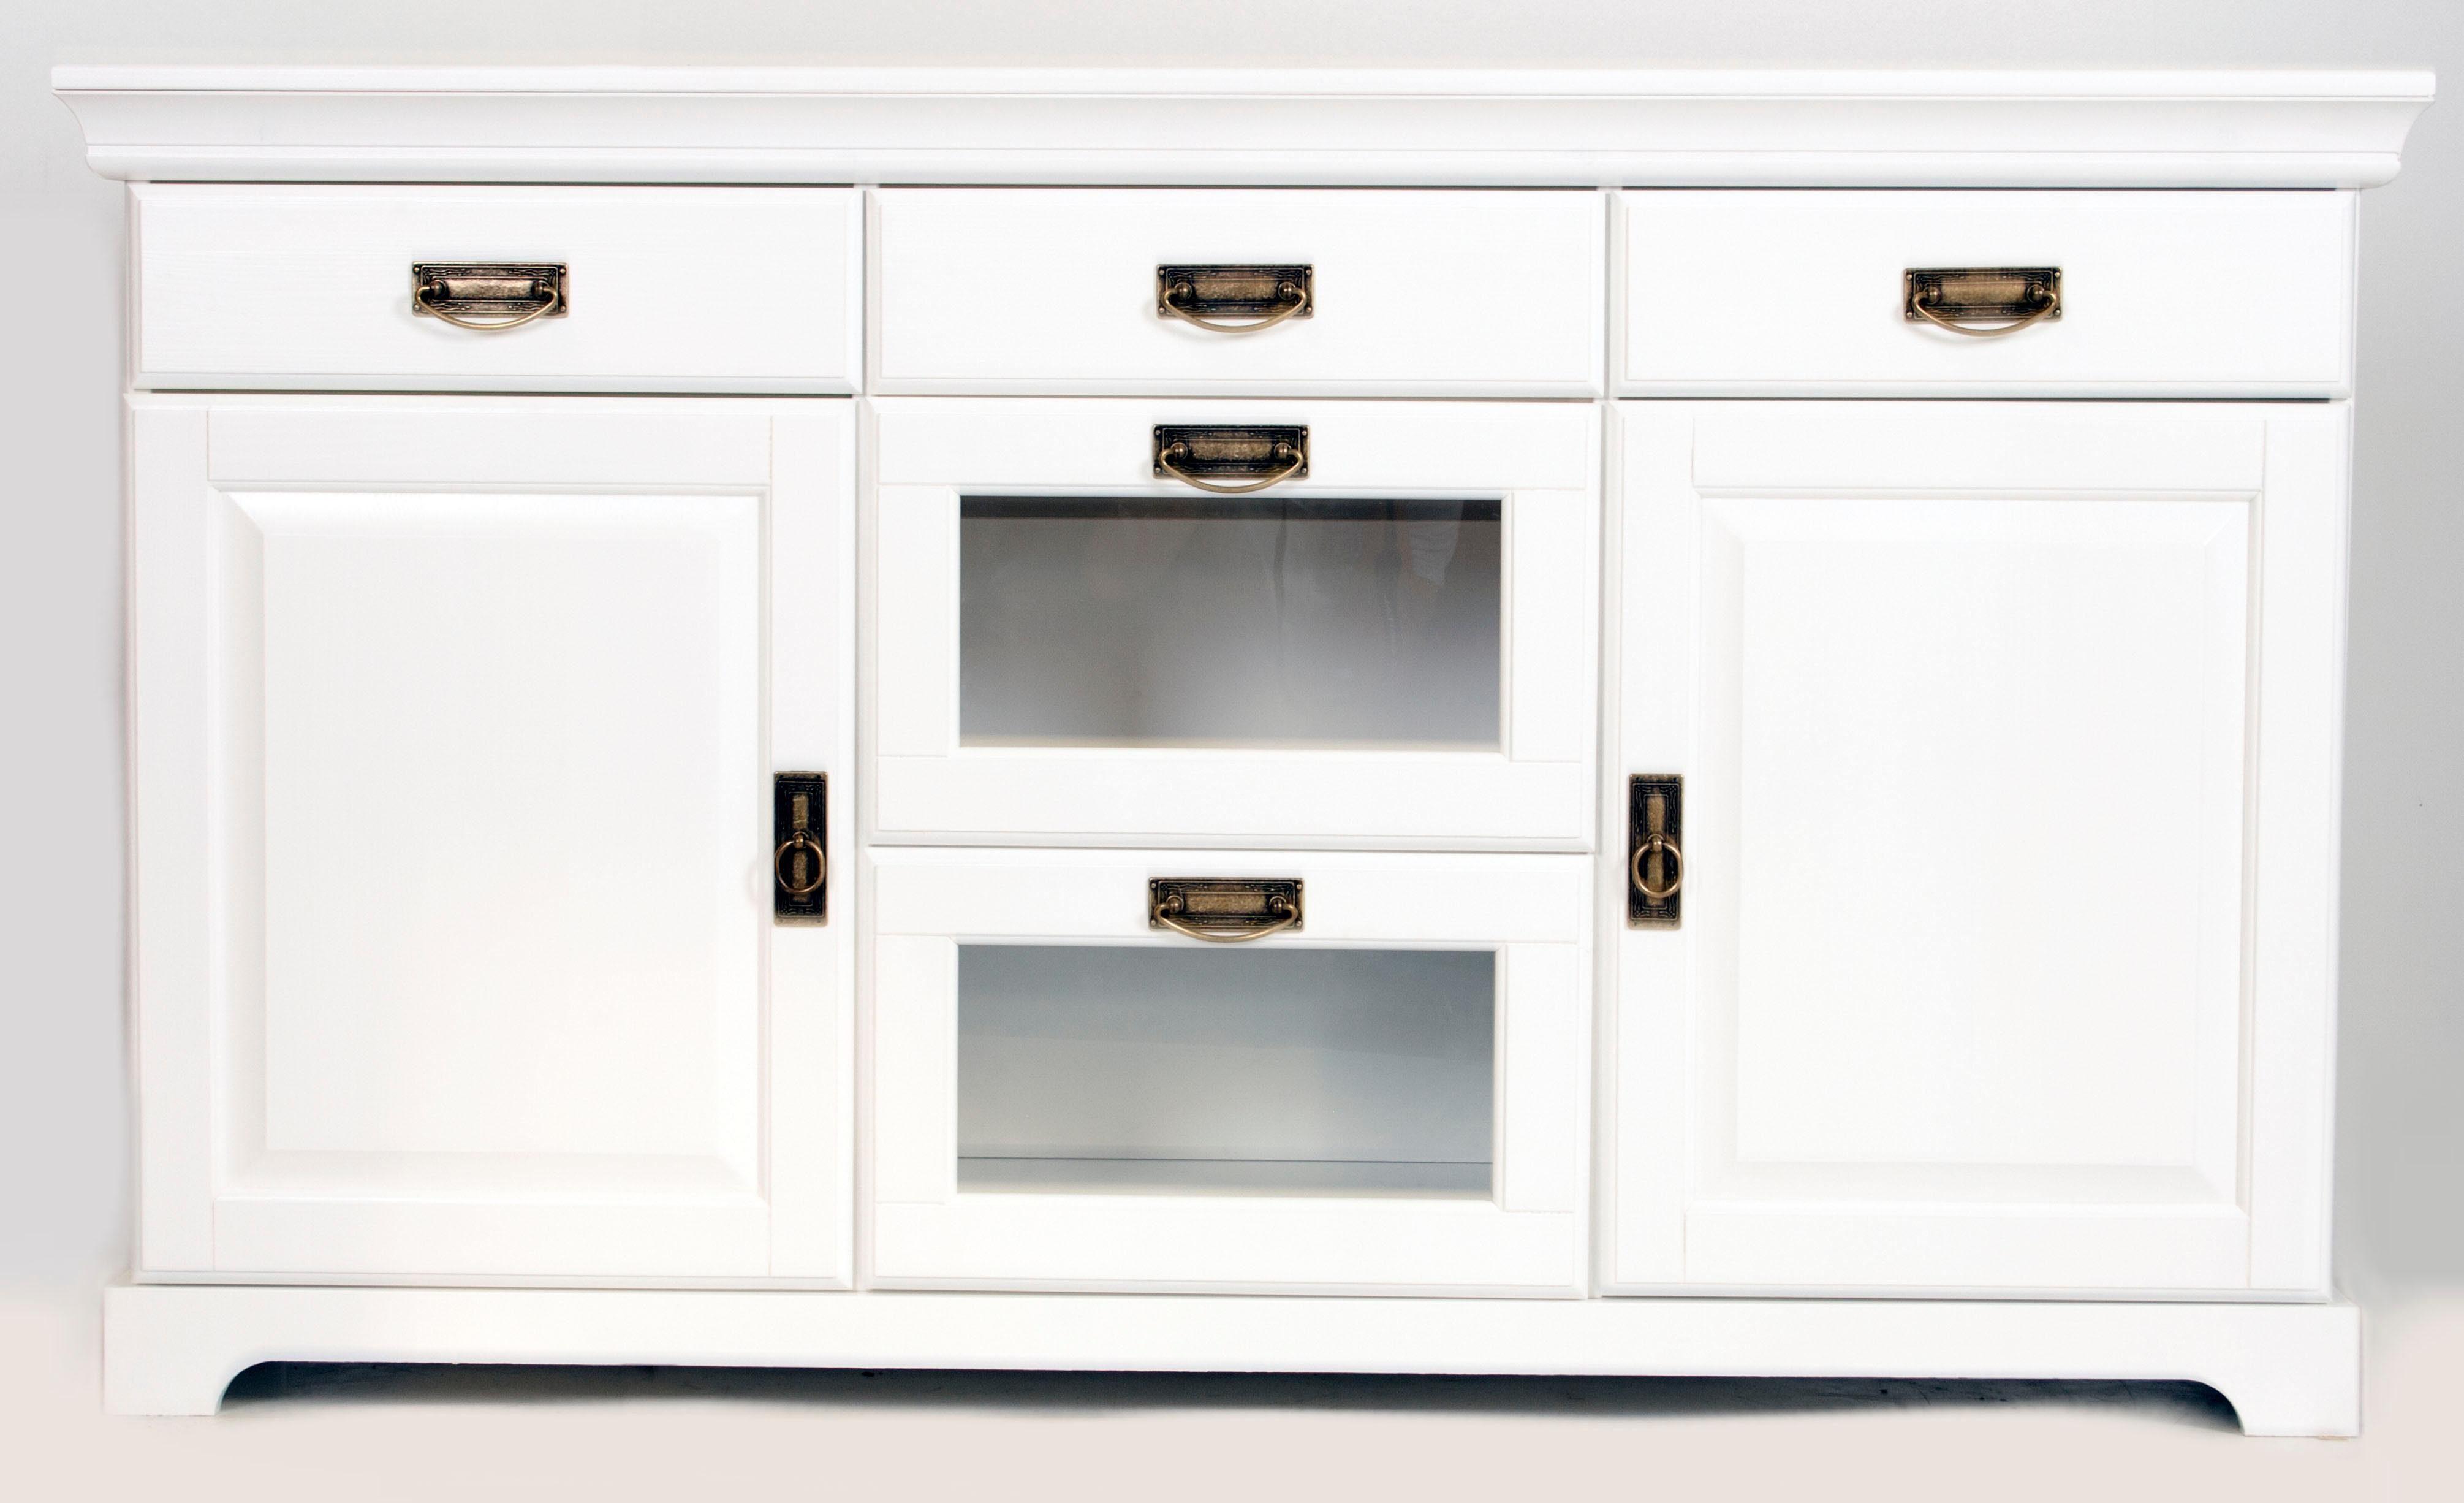 Sideboard, Home affaire, Breite 145 bzw. 180, Höhe 85 cm